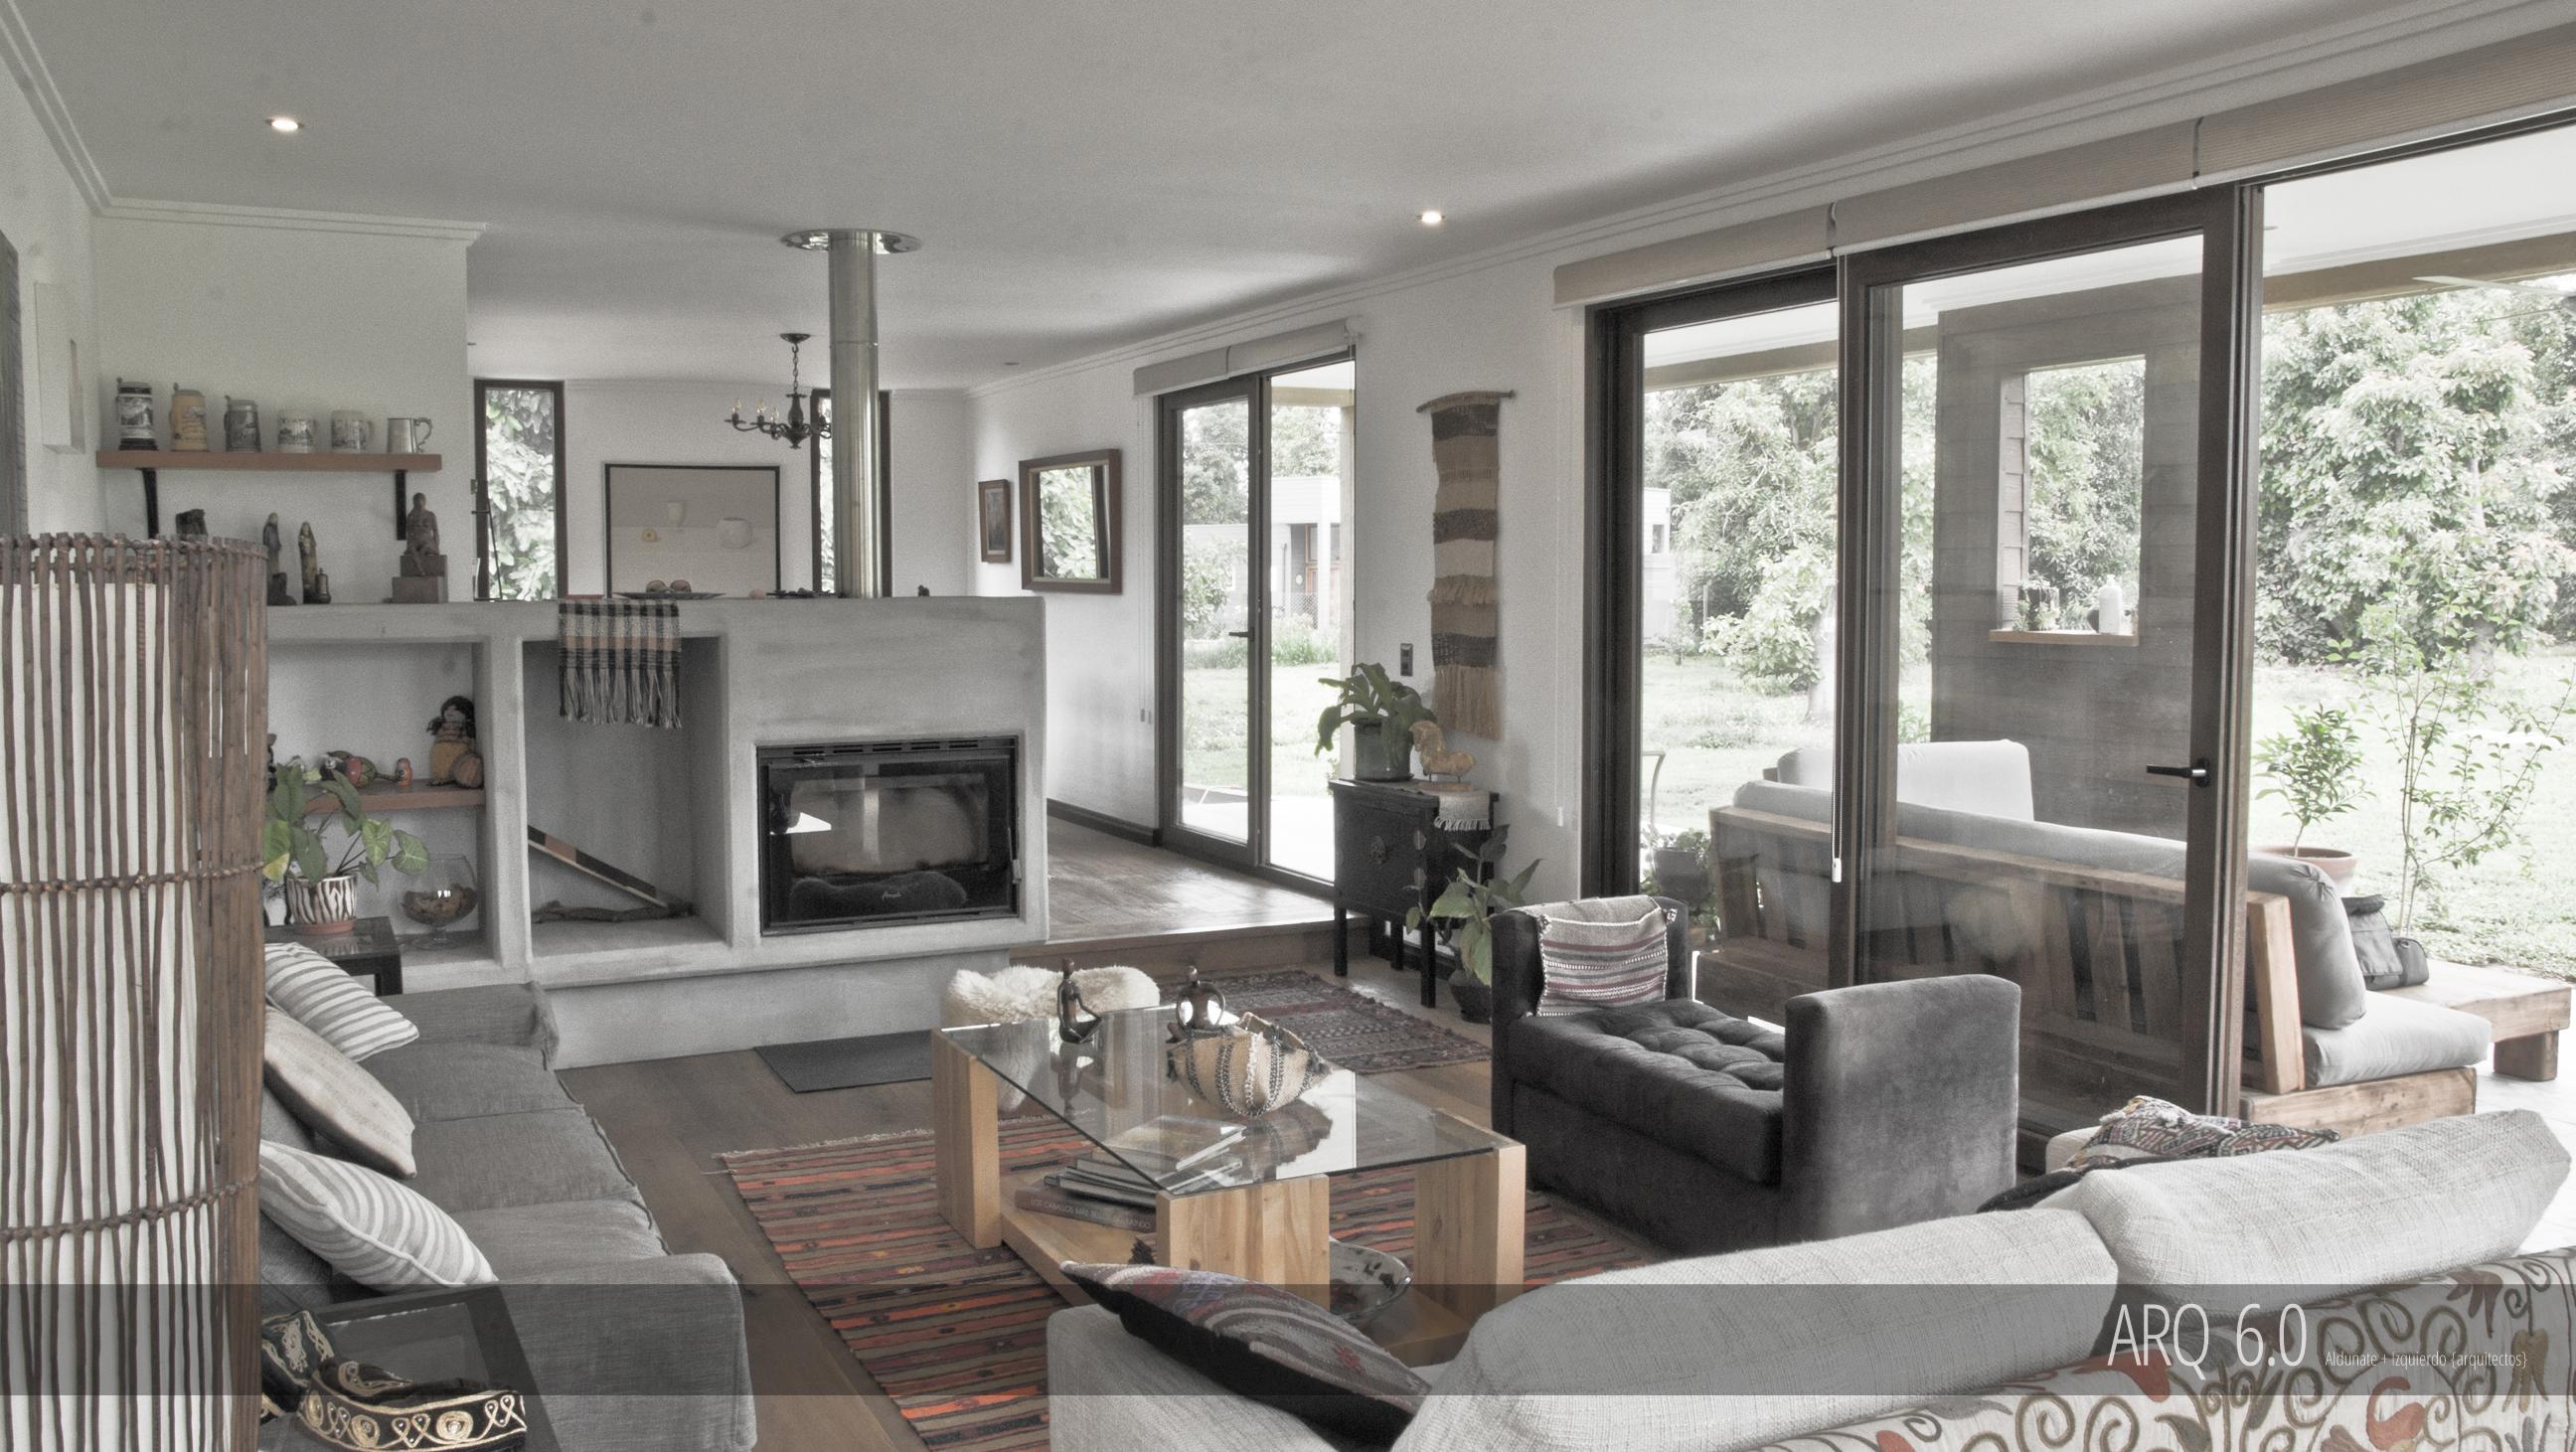 Arq6 - Casa Elzo Montero 16